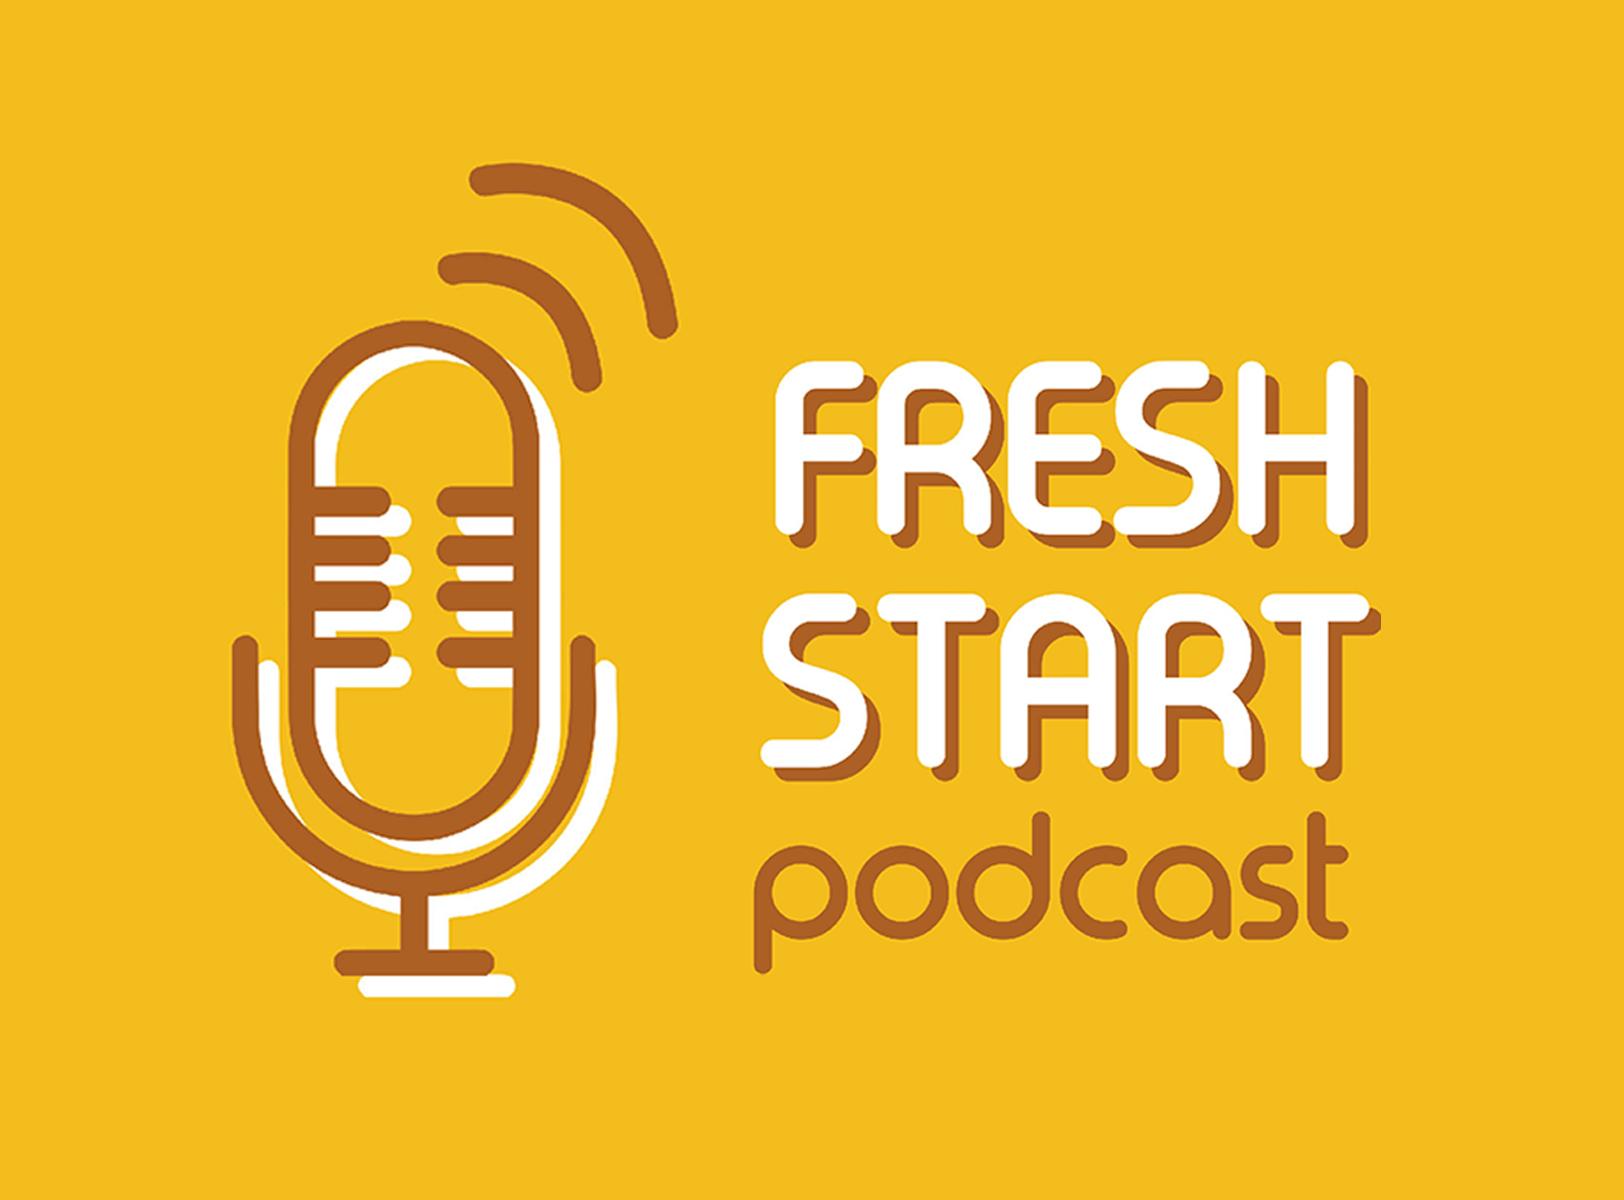 Fresh Start: Podcast News (5/15/2020 Fri.)